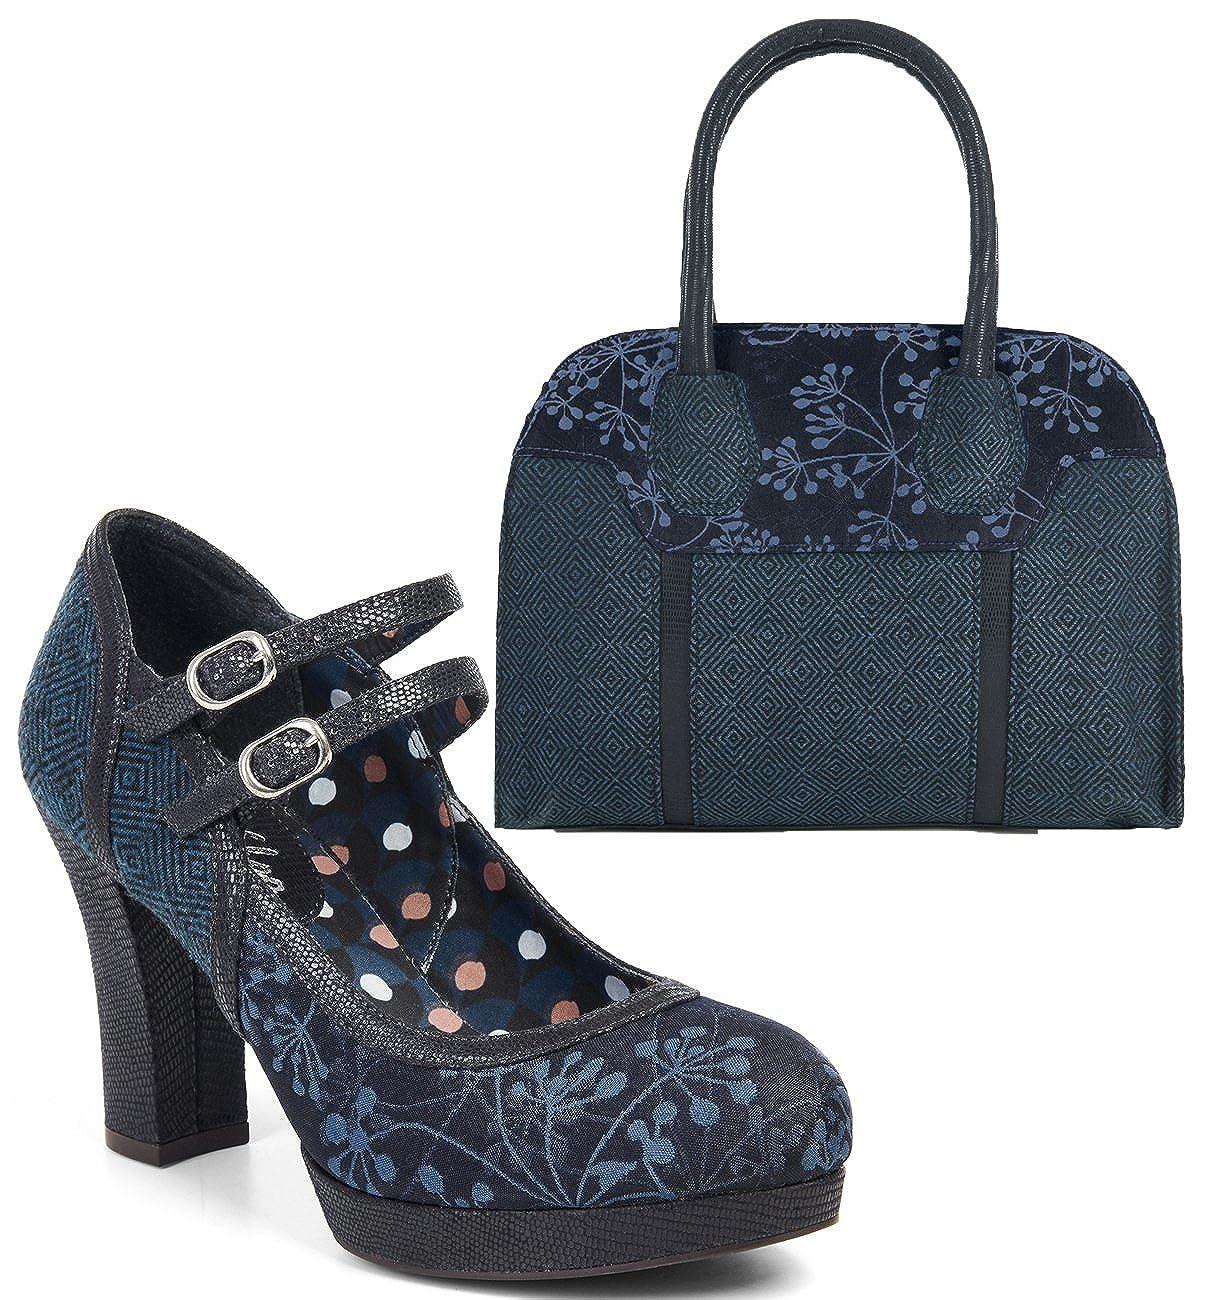 ee7f1d57992d Ruby Shoo Women s Laura Chunky Mary Jane Bar Shoes   Matching Cancun Bag   Amazon.co.uk  Shoes   Bags